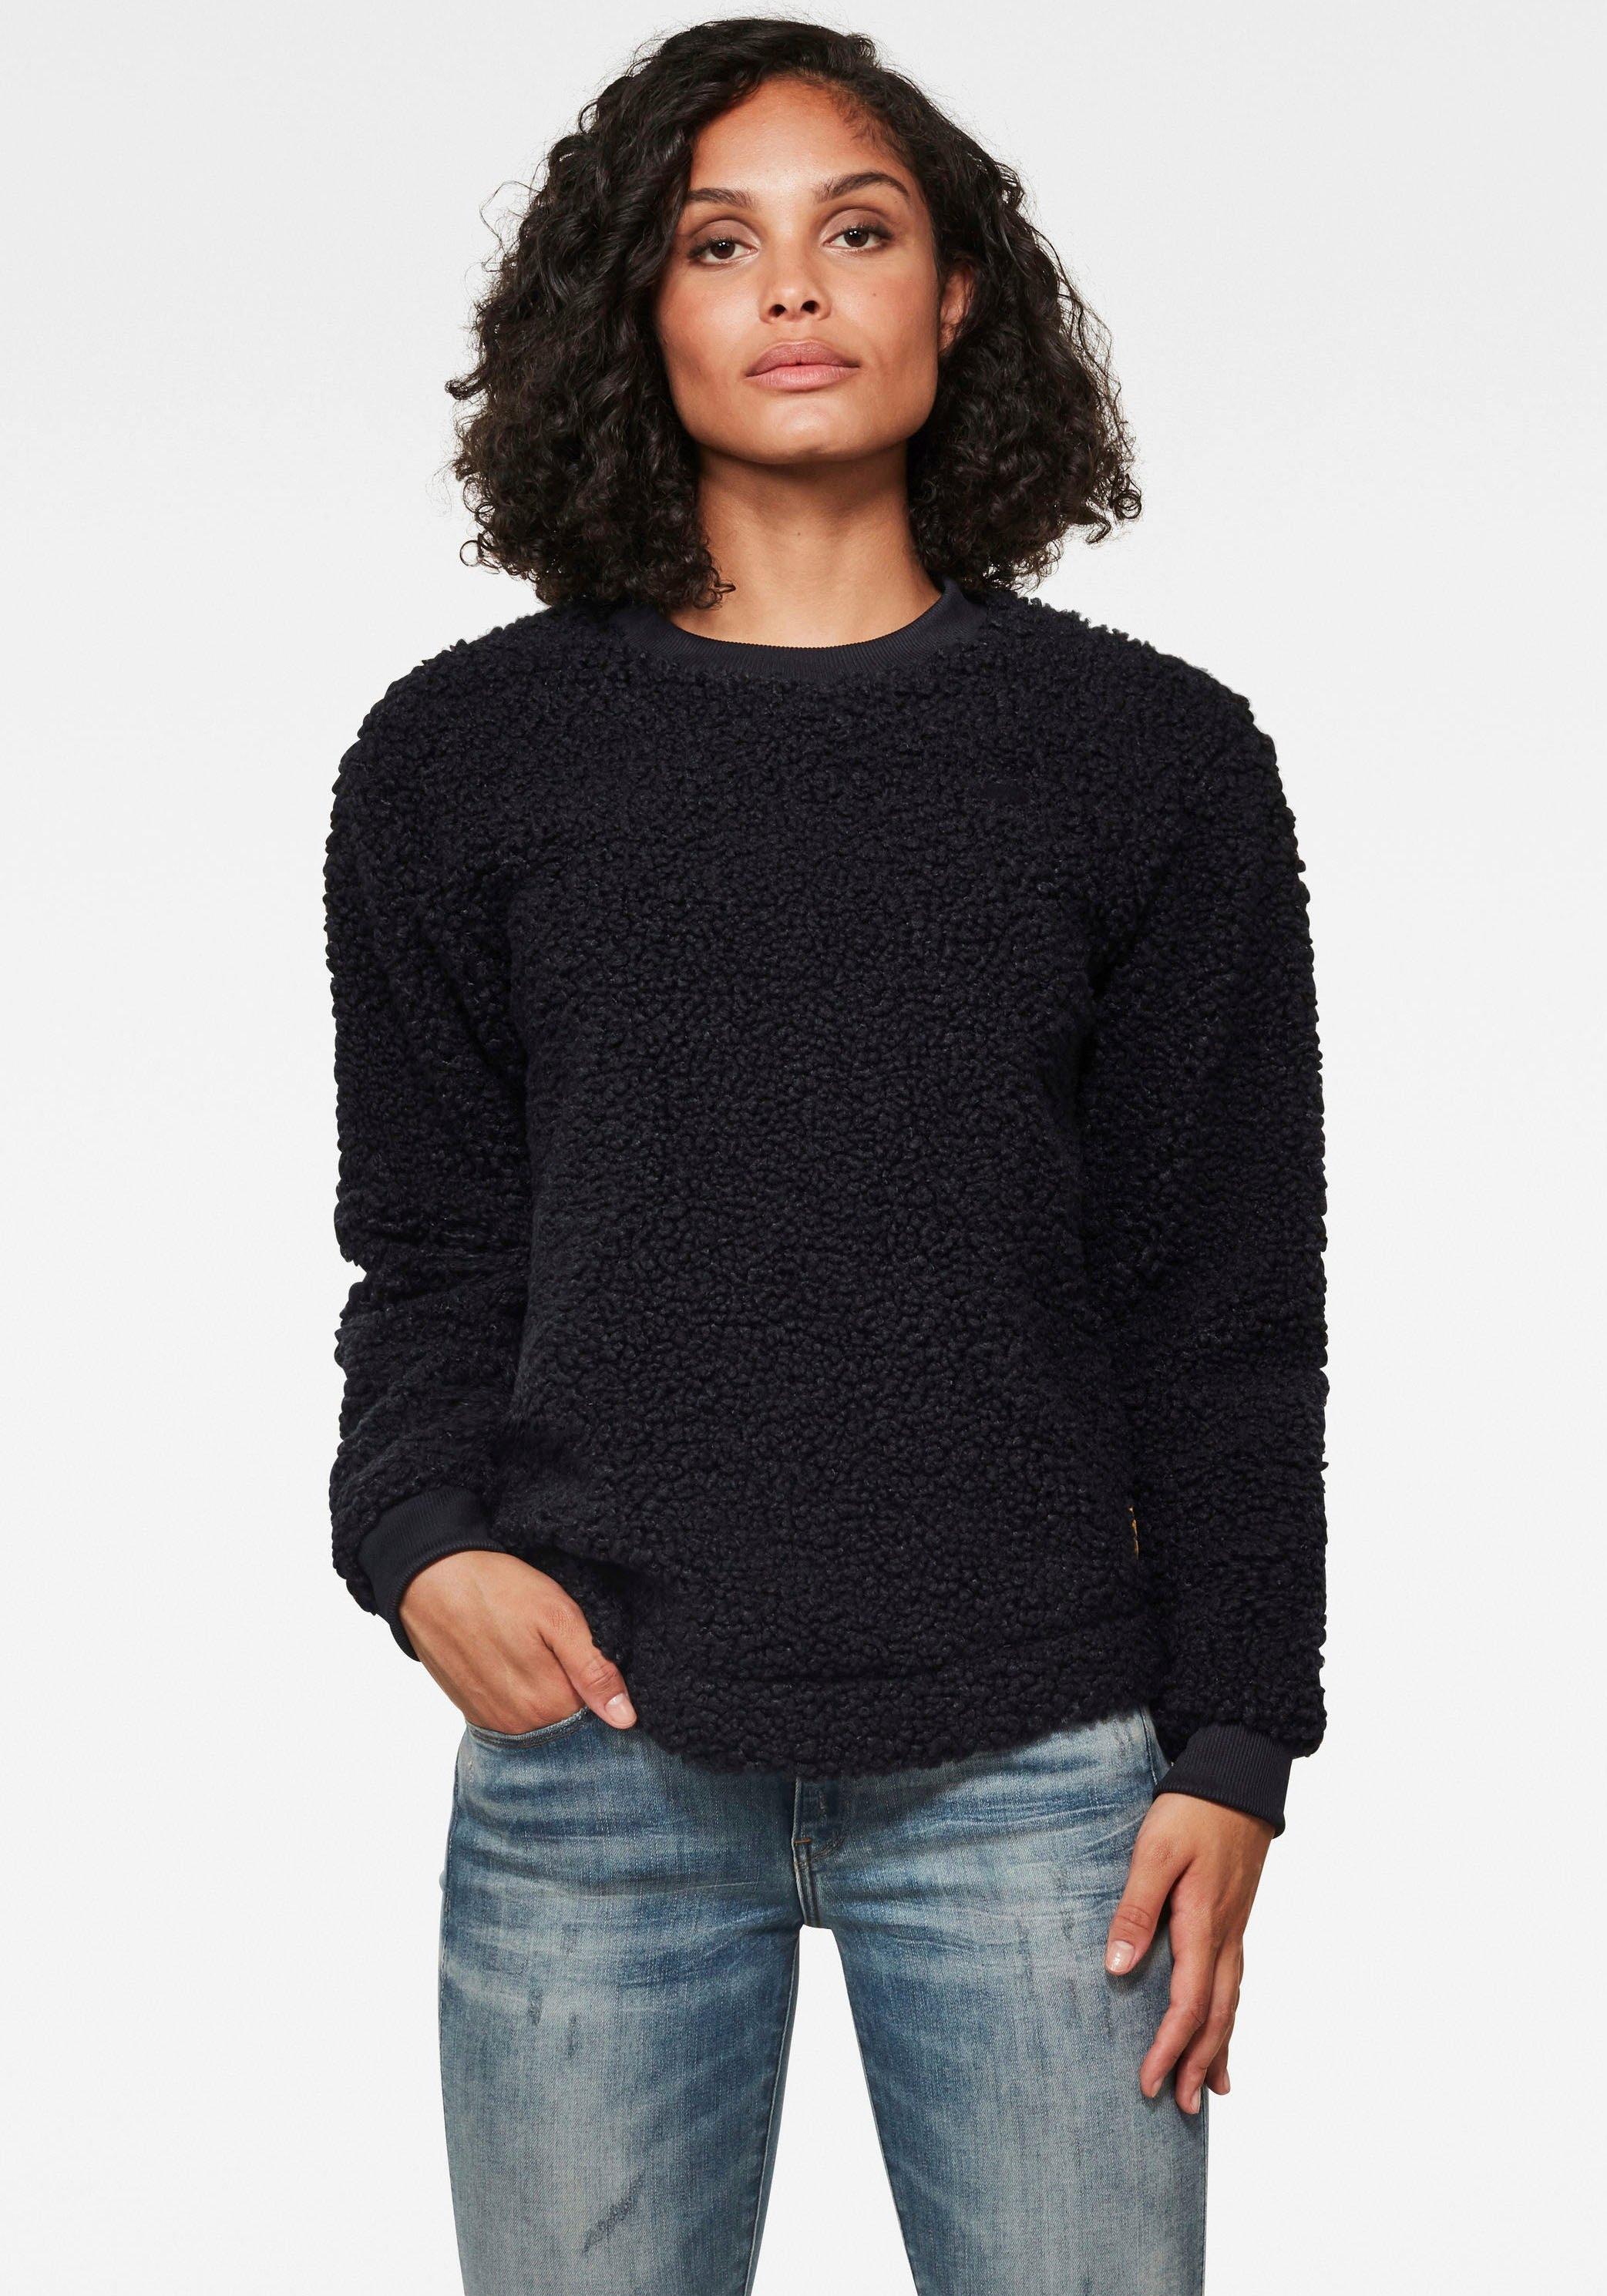 G-Star Raw sweatshirt »Carley« veilig op otto.nl kopen